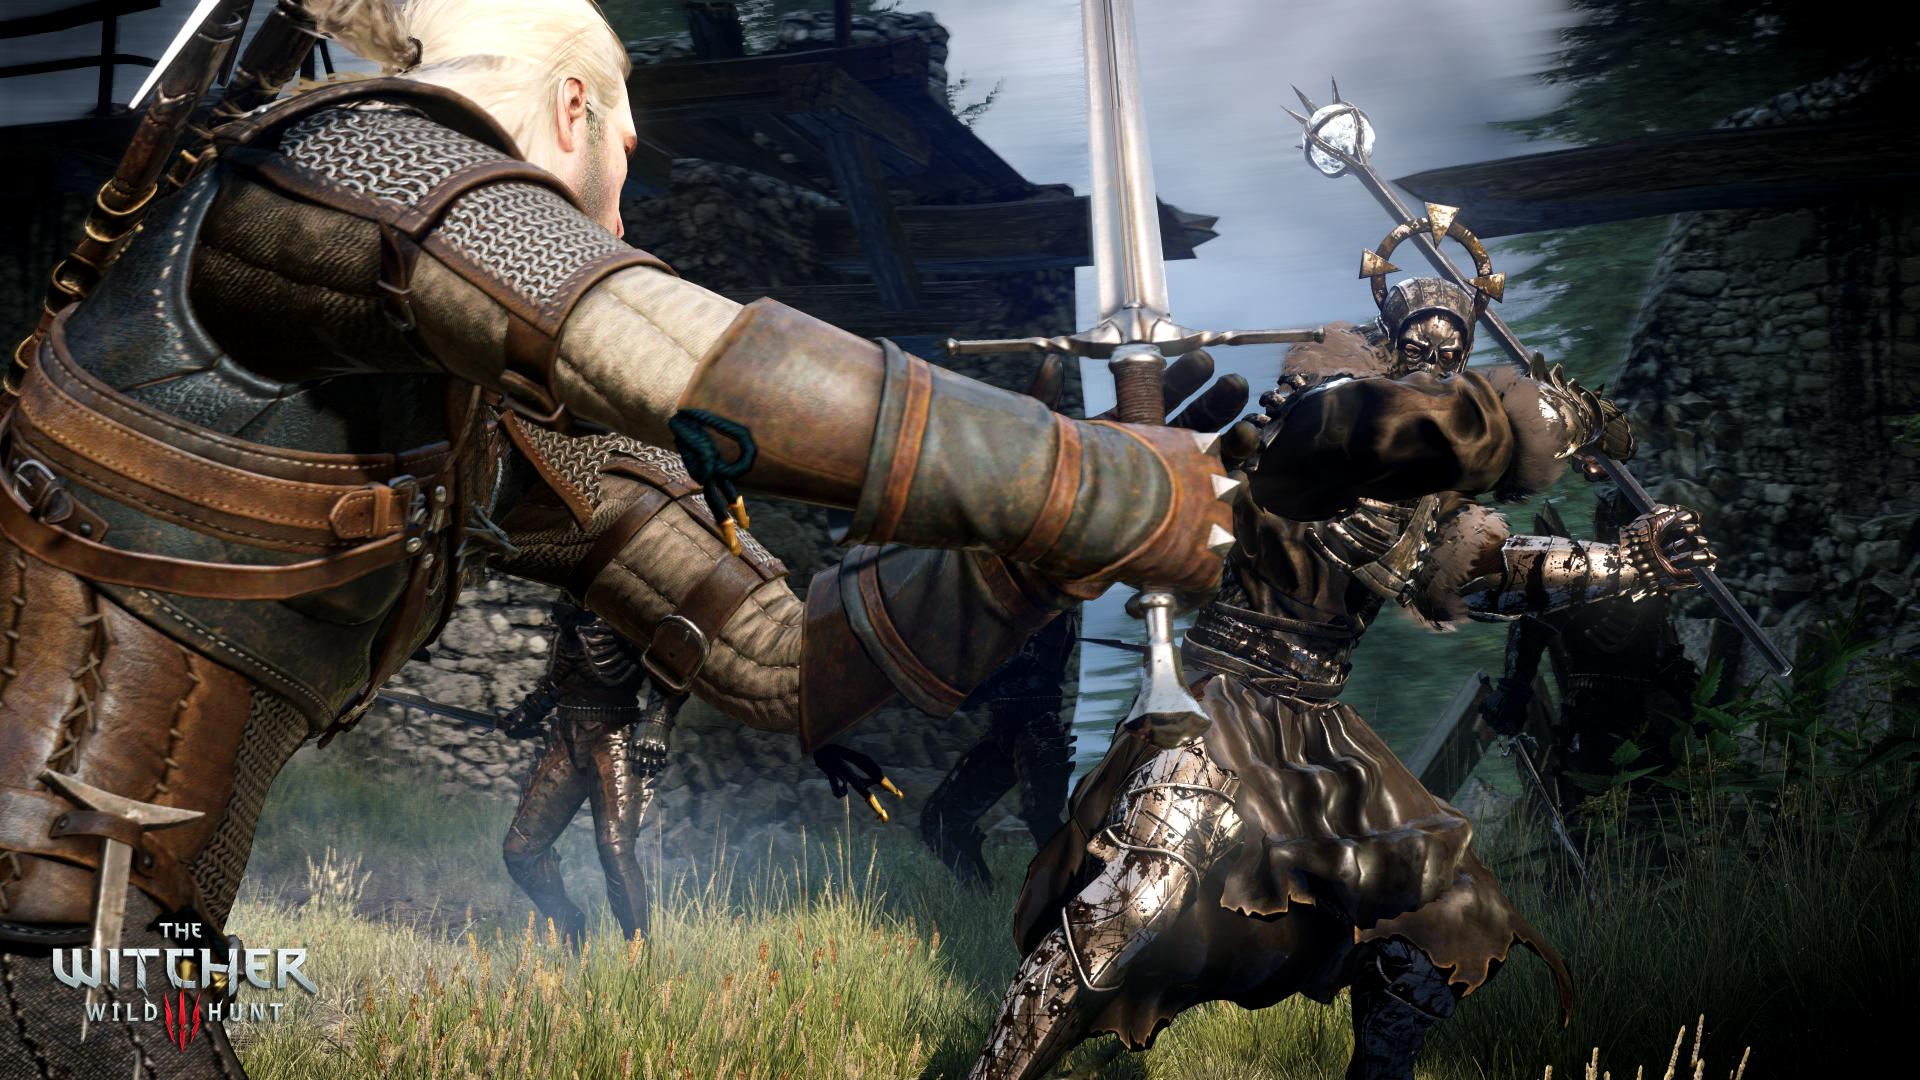 The_Witcher_3_Wild_Hunt_Geralt_battling_a_general_of_the_Hunt_3